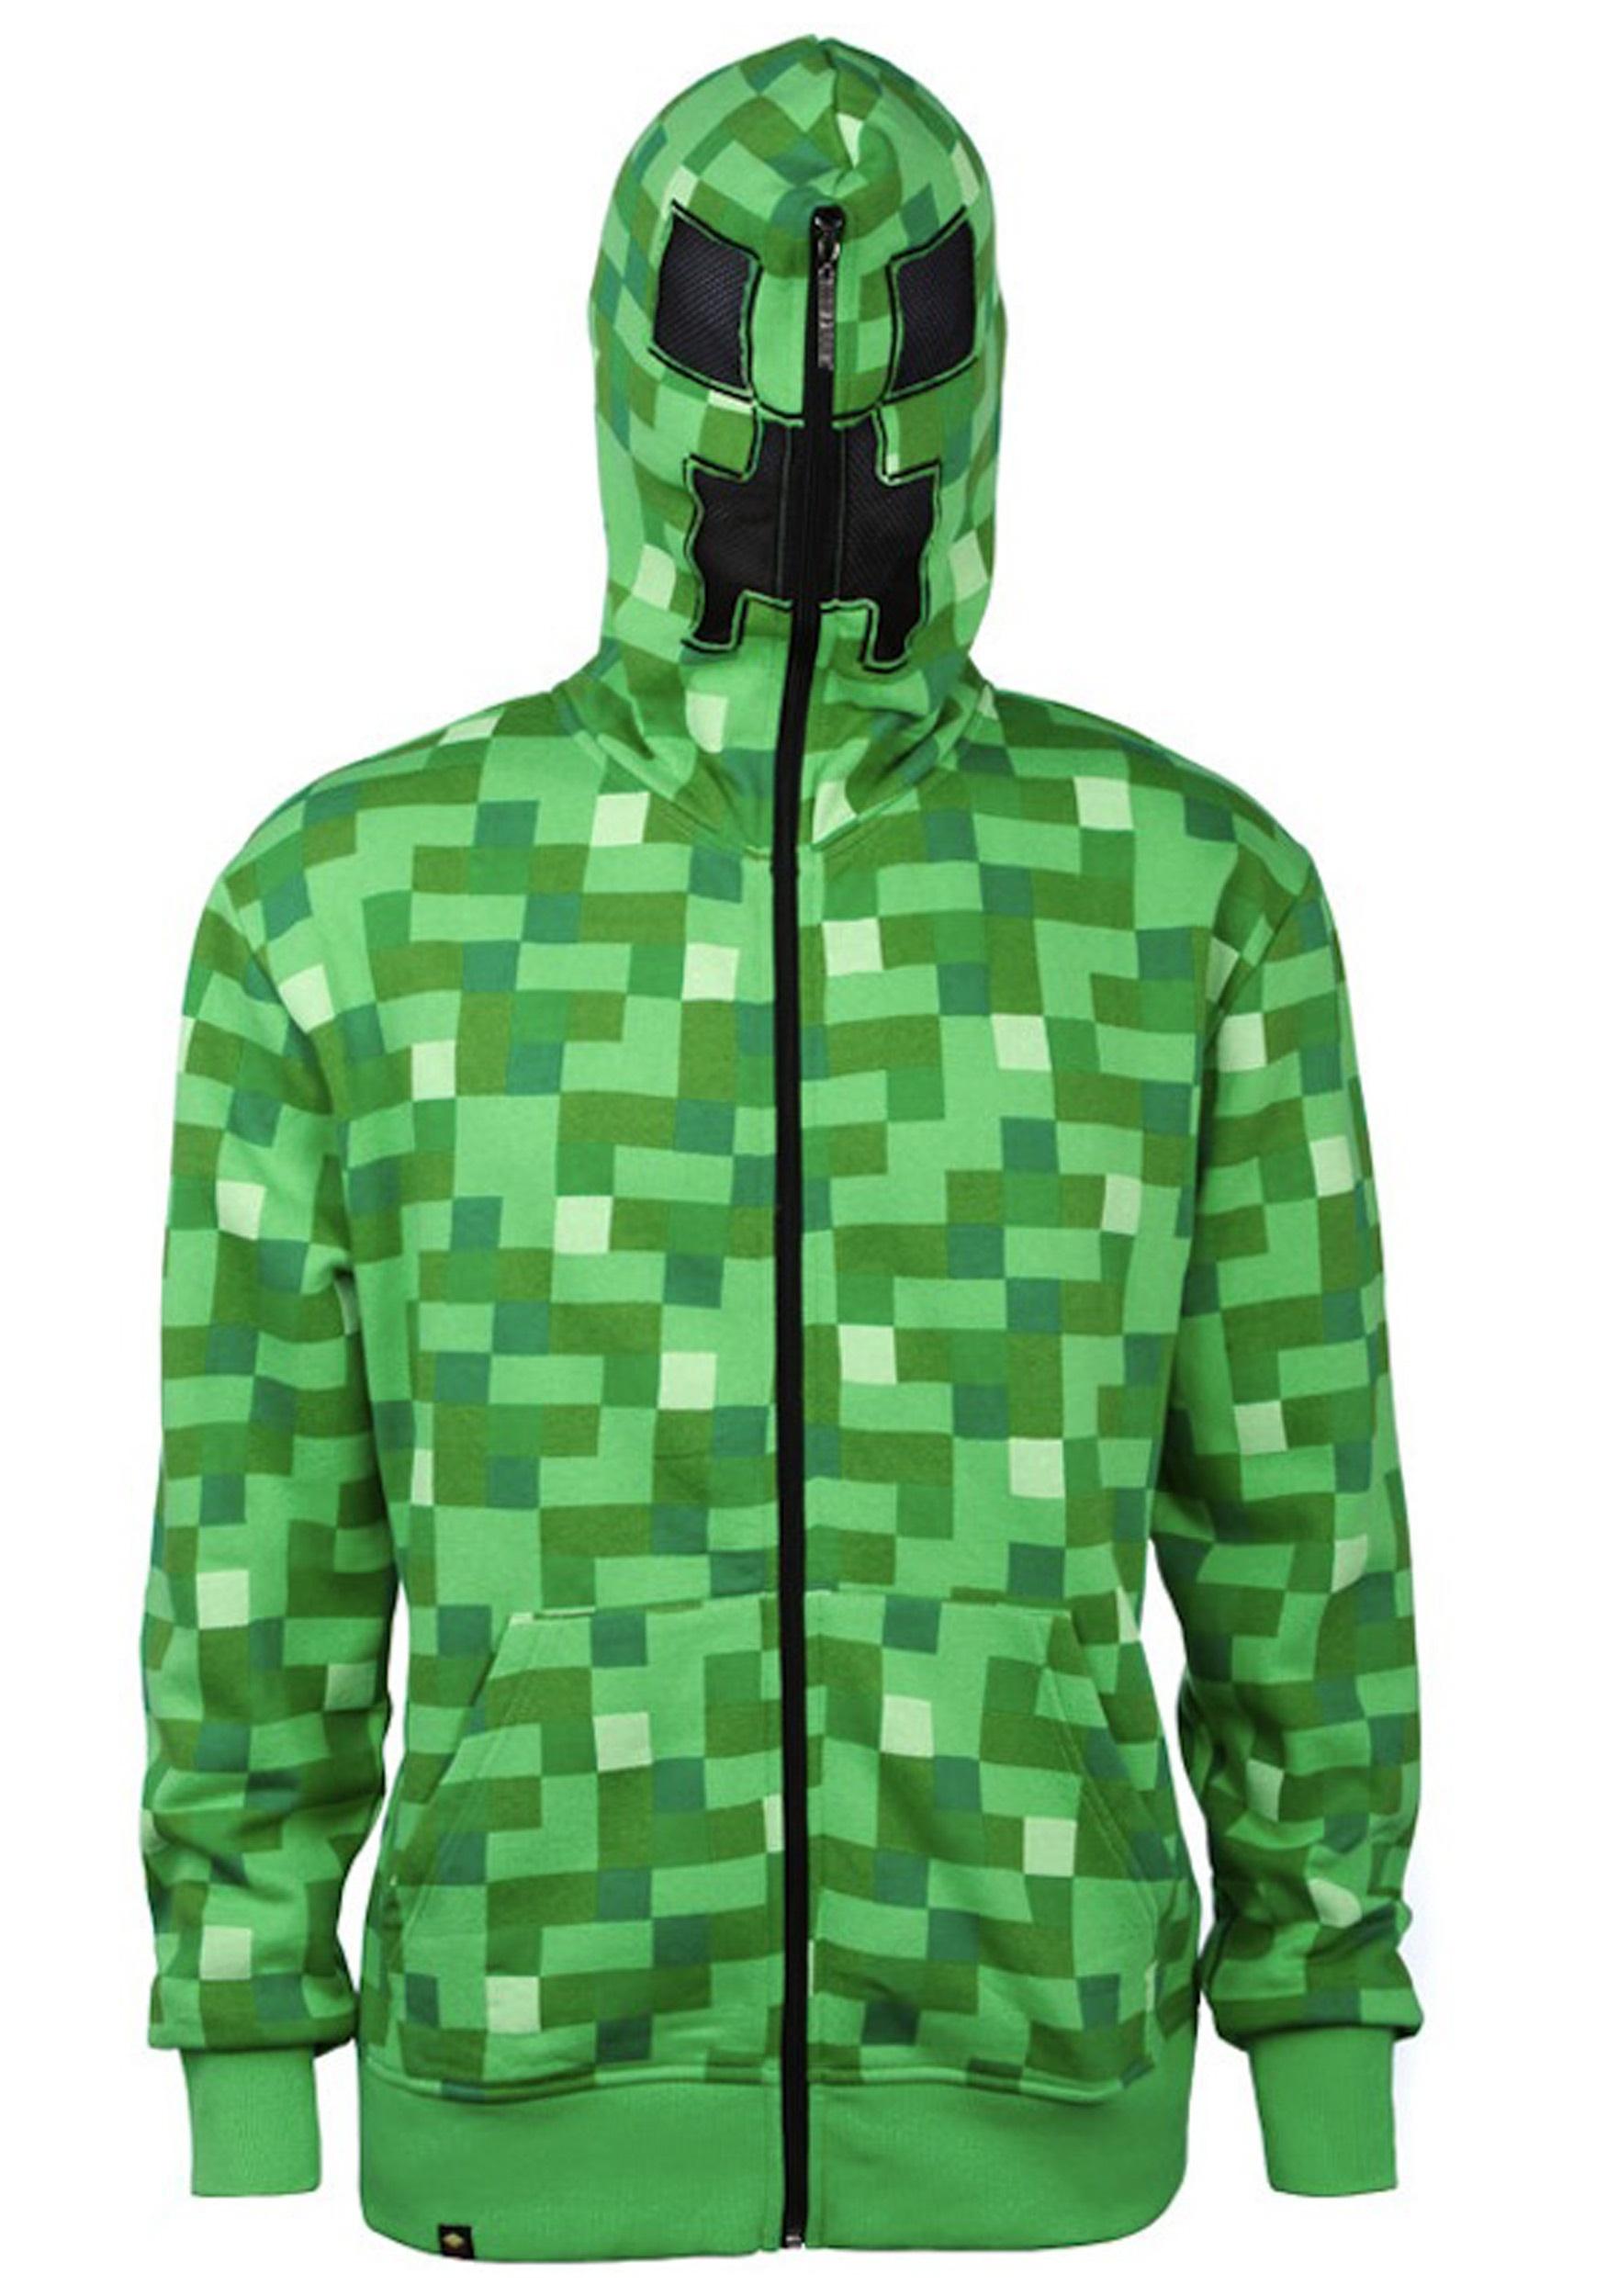 Kids' Minecraft Creeper Hooded Sweatshirt